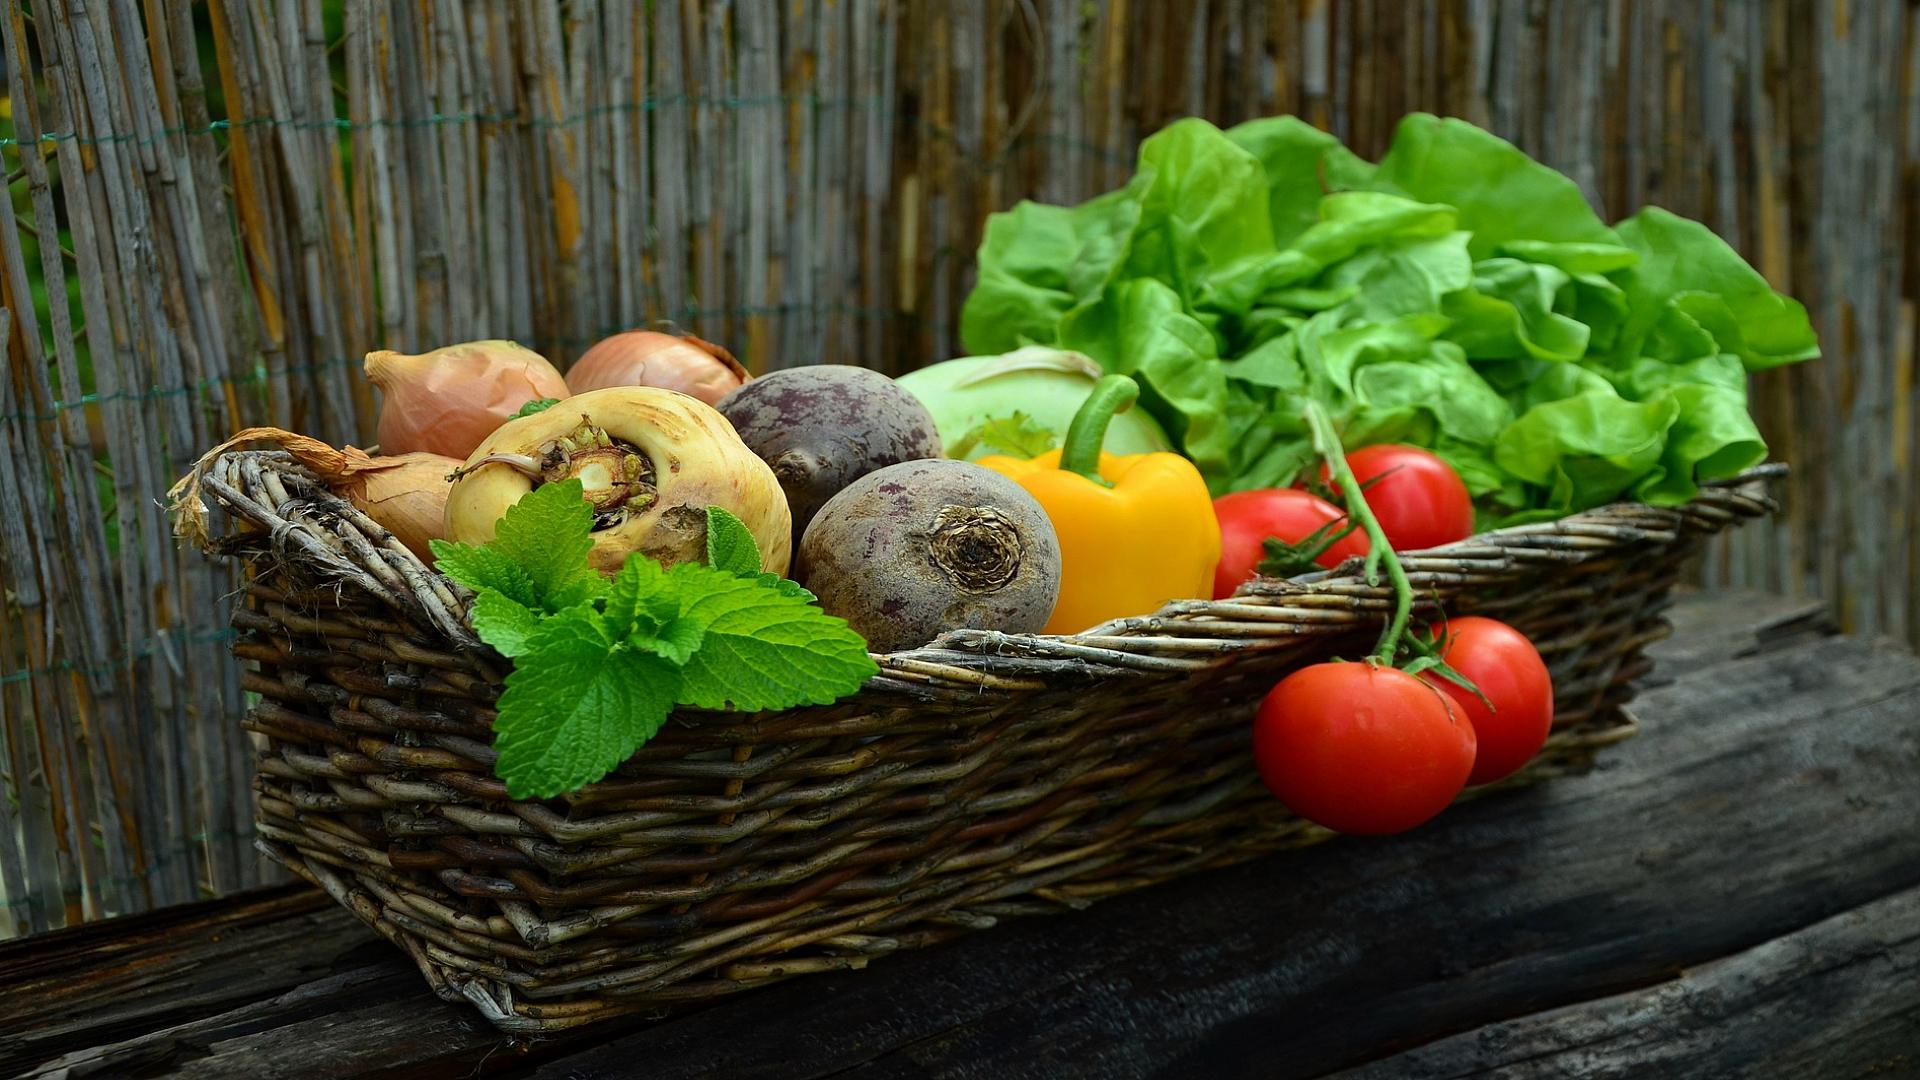 Condesign - Zelenina v košíku